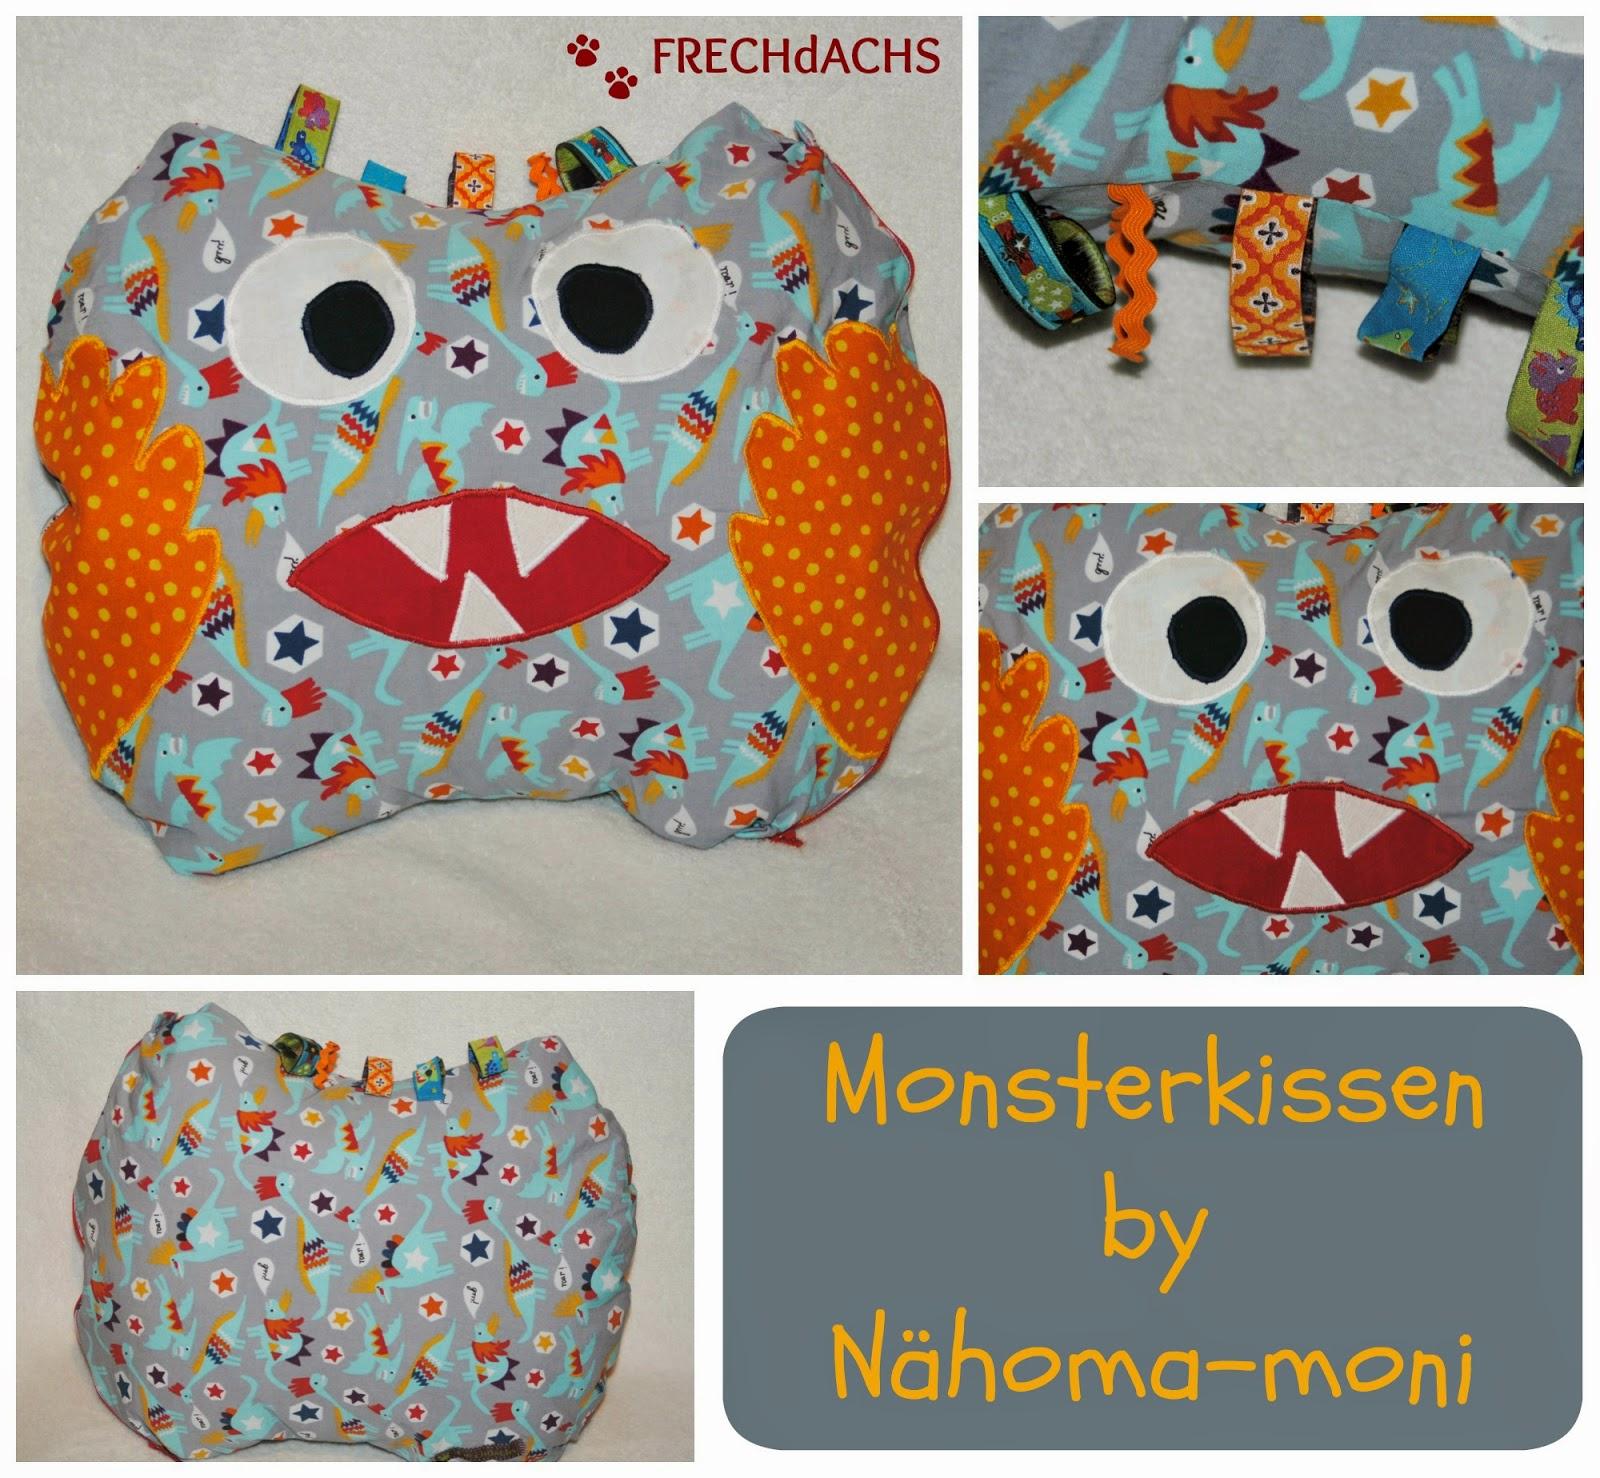 Naehoma - moni: Freebook, Eulen ,Monster & Co, Probenähergebnisse